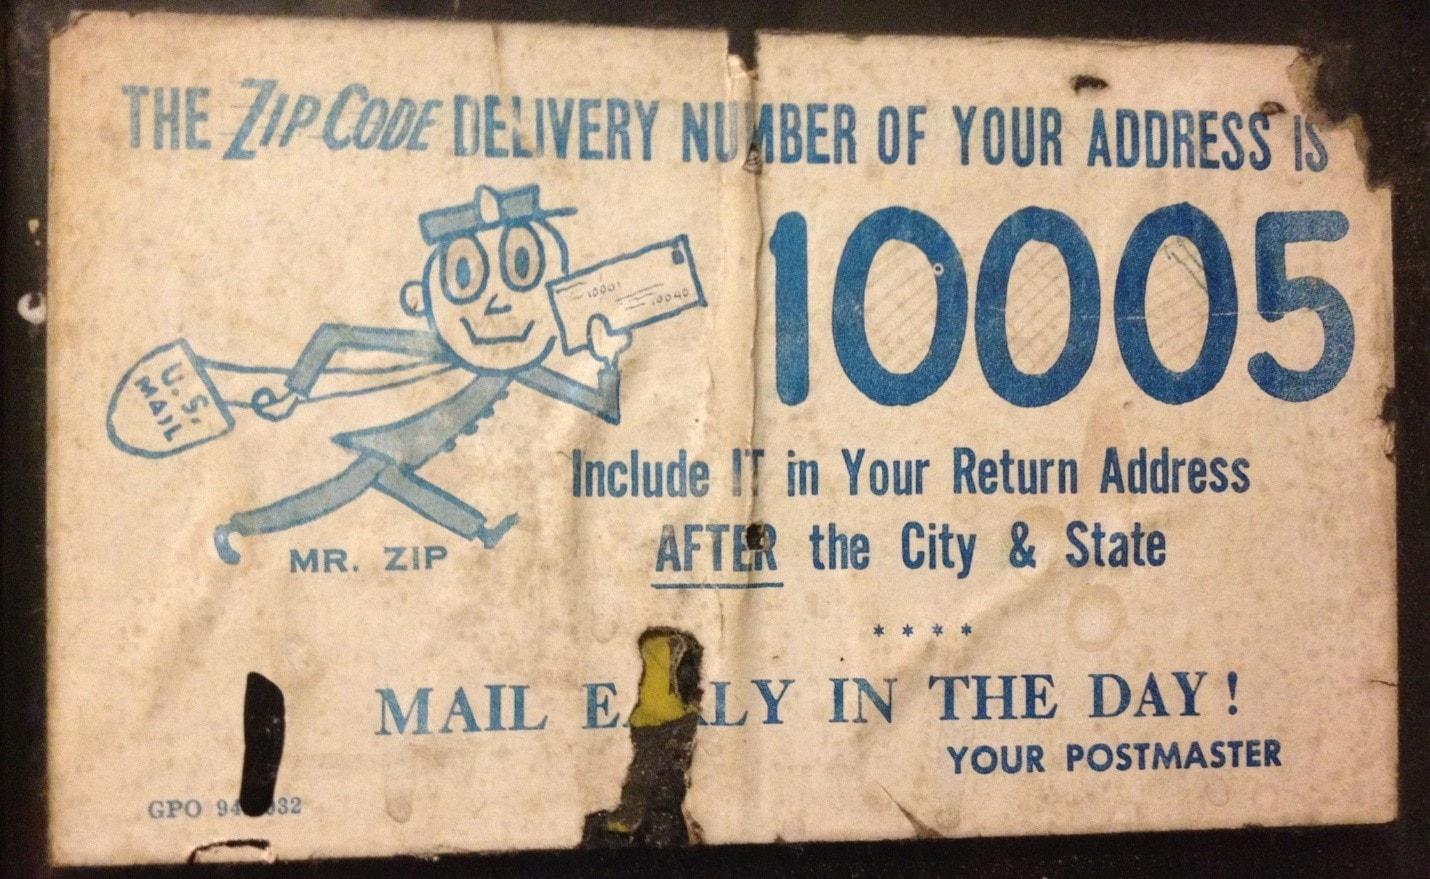 00691 – The First 5-Digit ZIP Code